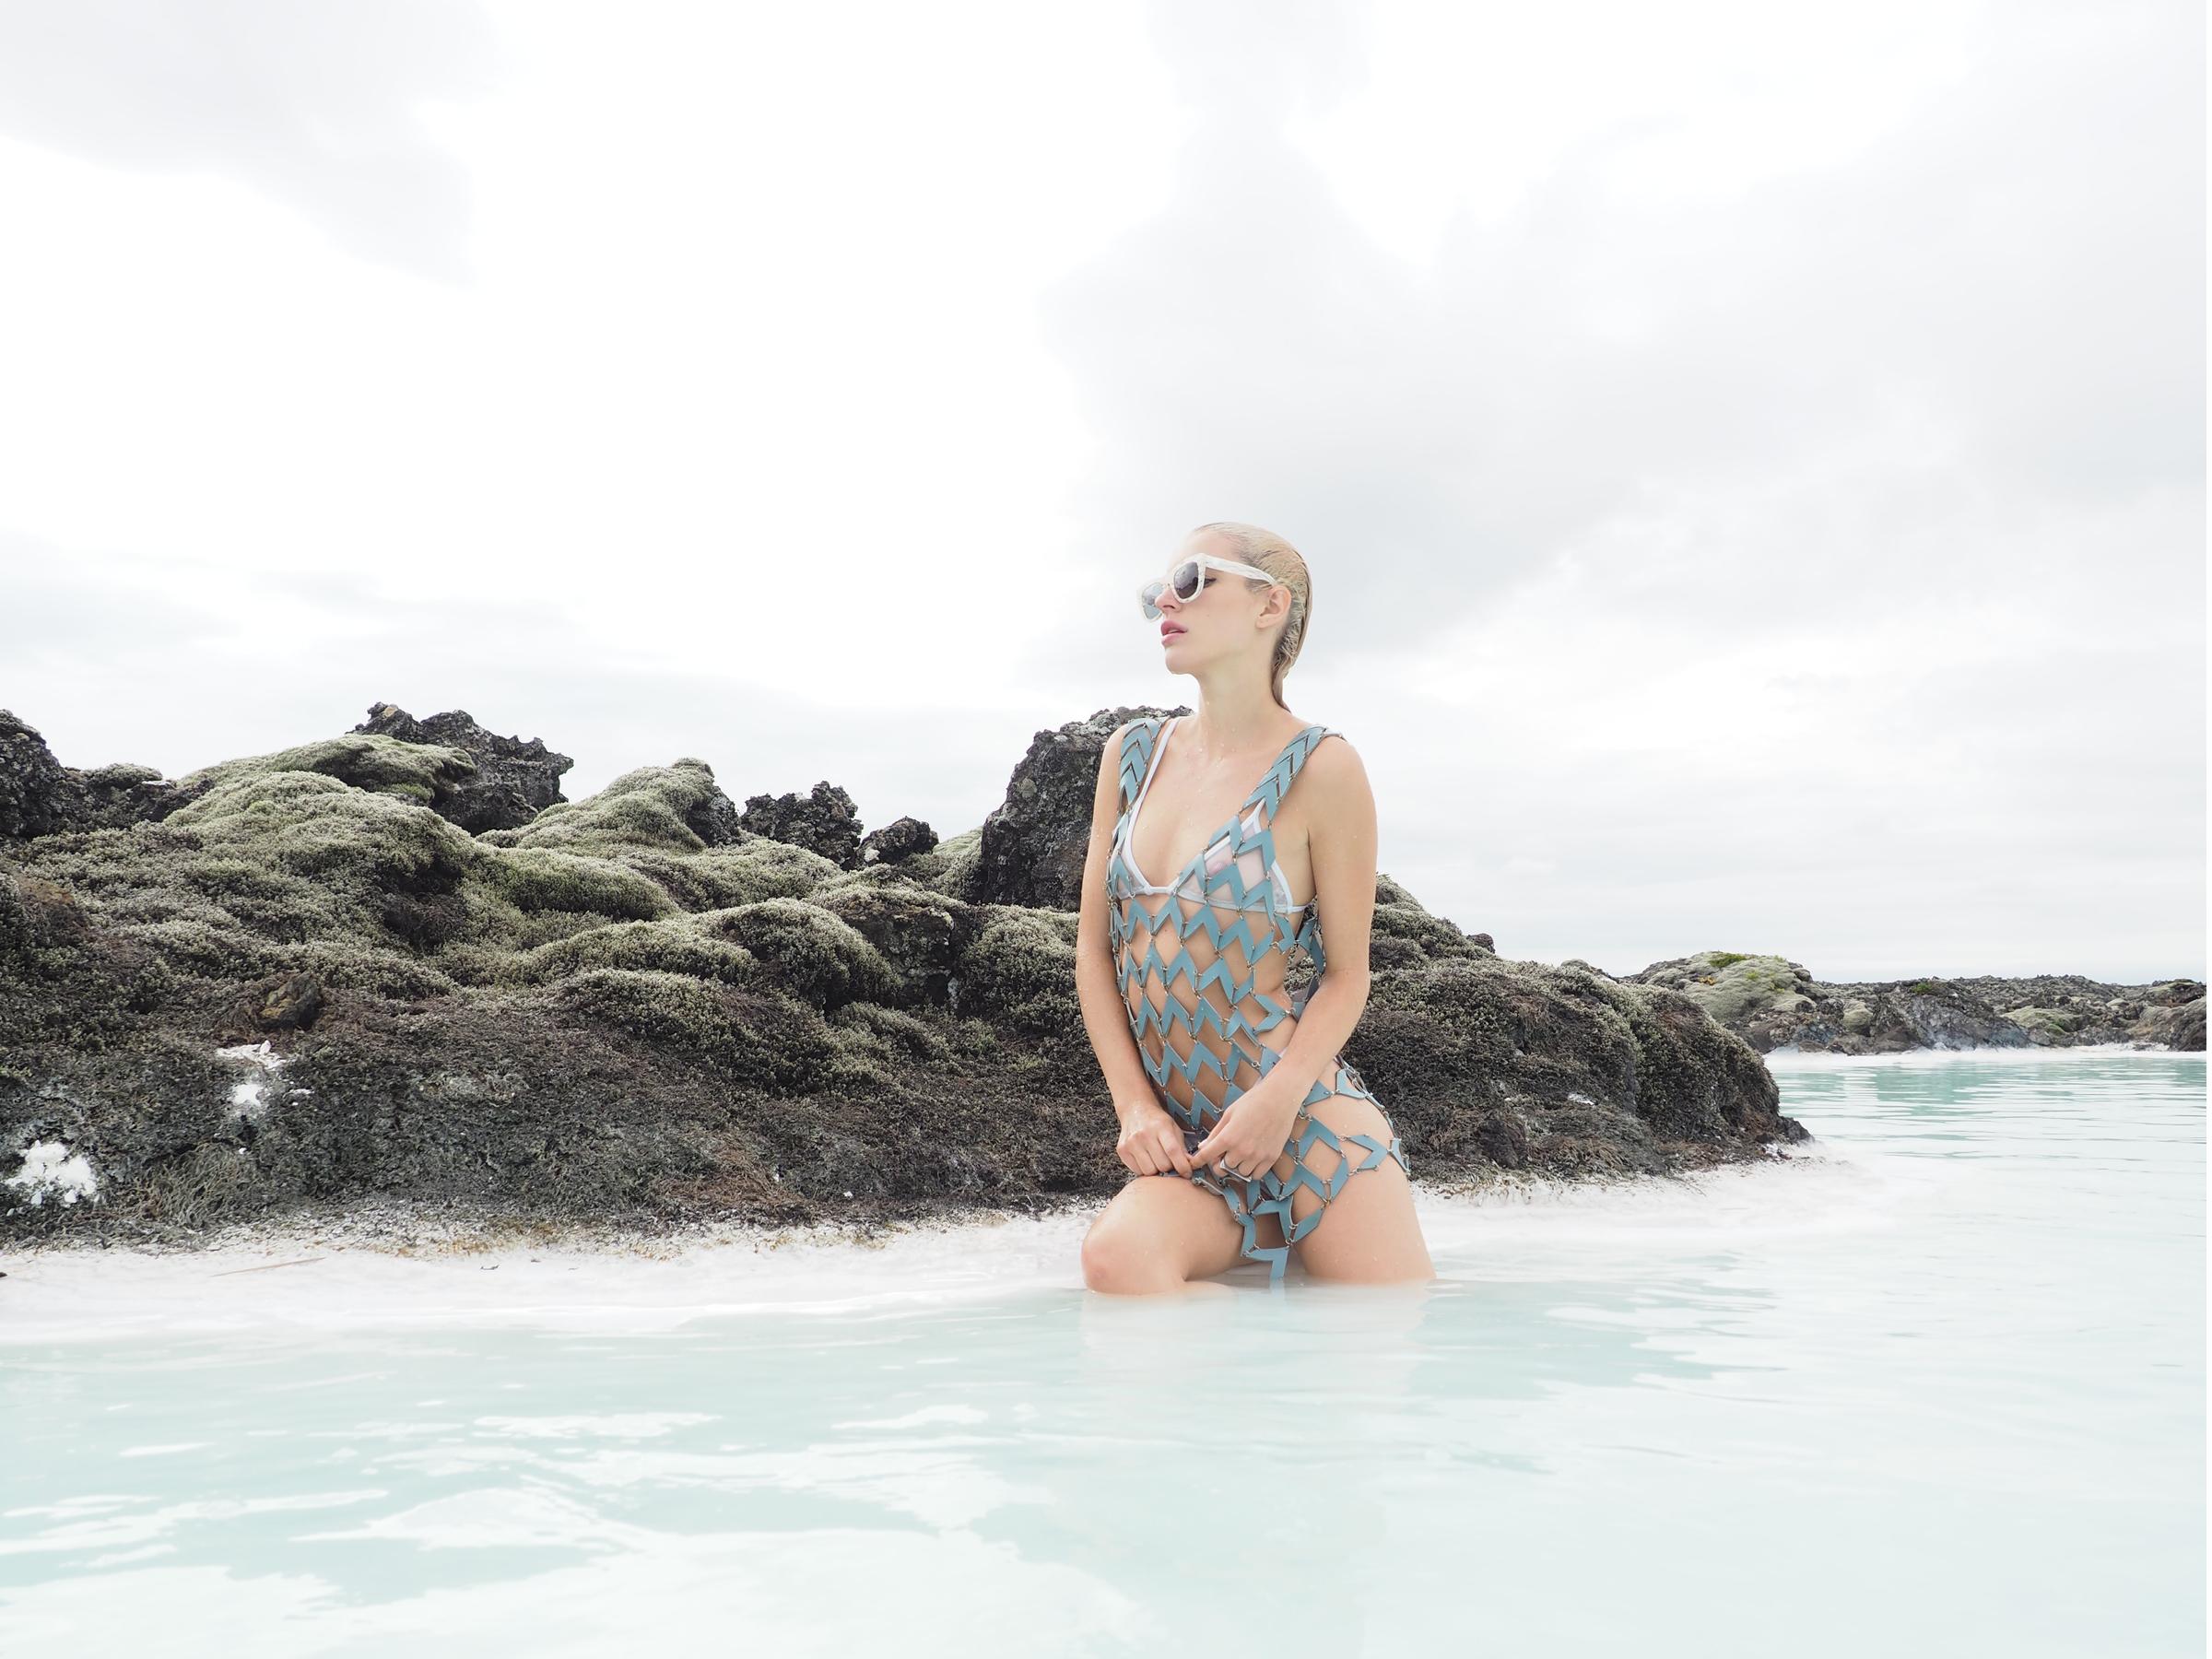 Chloe is wearing GALS MARINA Sunglasses by RETROSUPERFUTURE + Dress by Bowenero